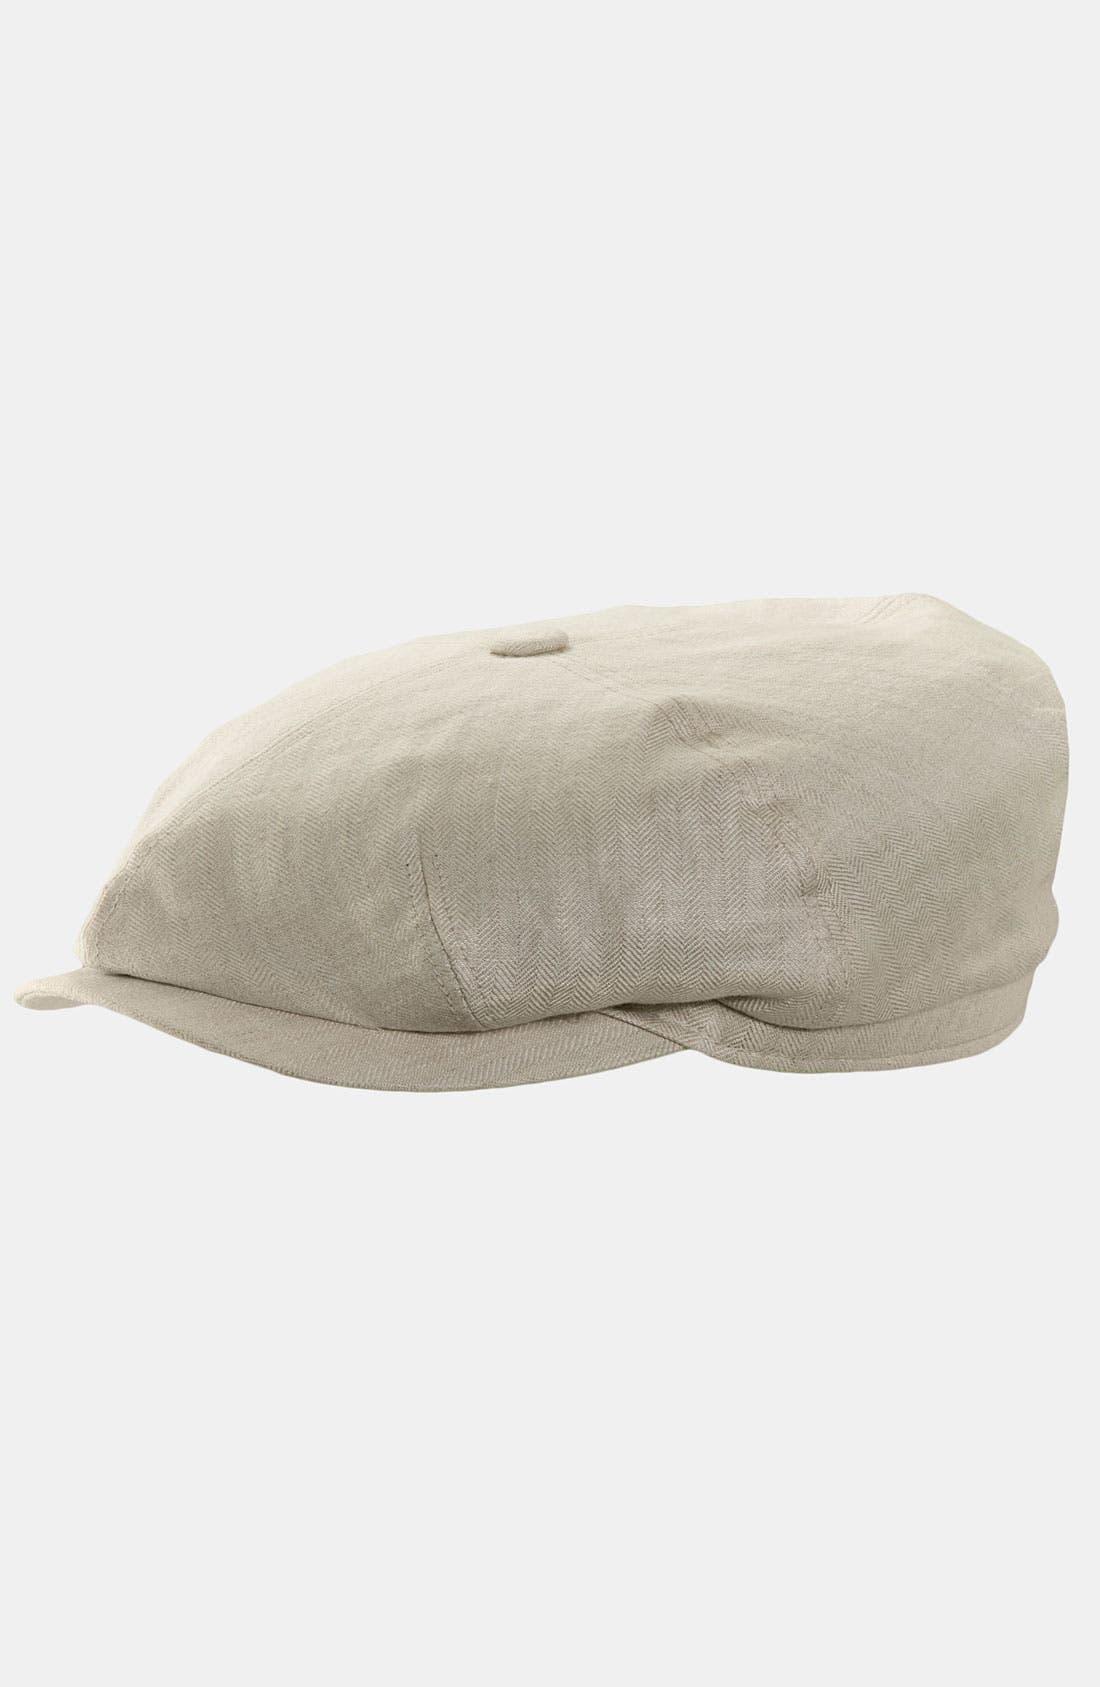 Alternate Image 1 Selected - Stetson Linen Newsboy Cap